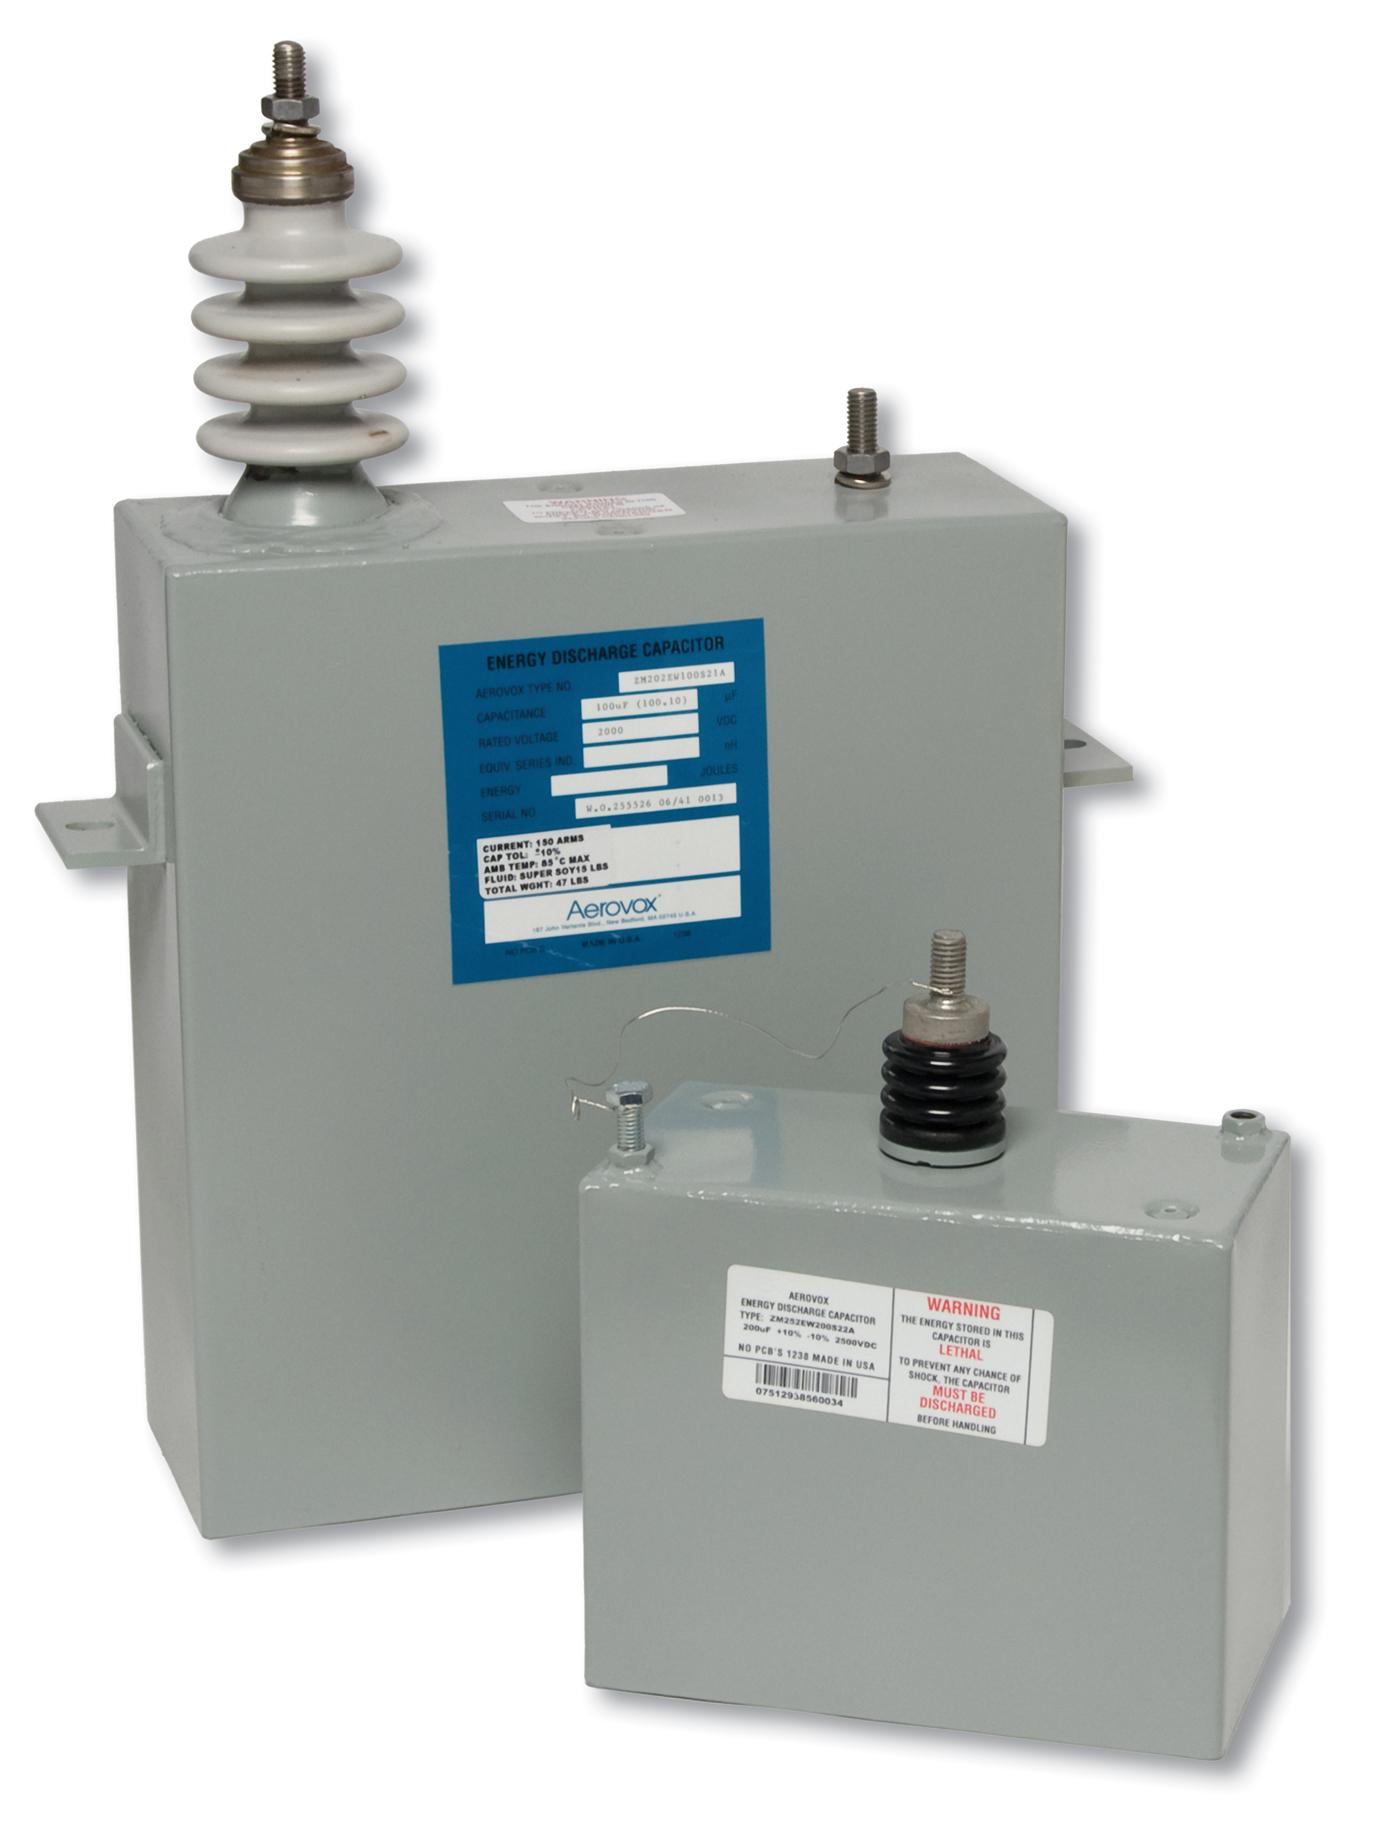 High Voltage Capacitors : Aerovox corp increases high voltage range in film capacitors